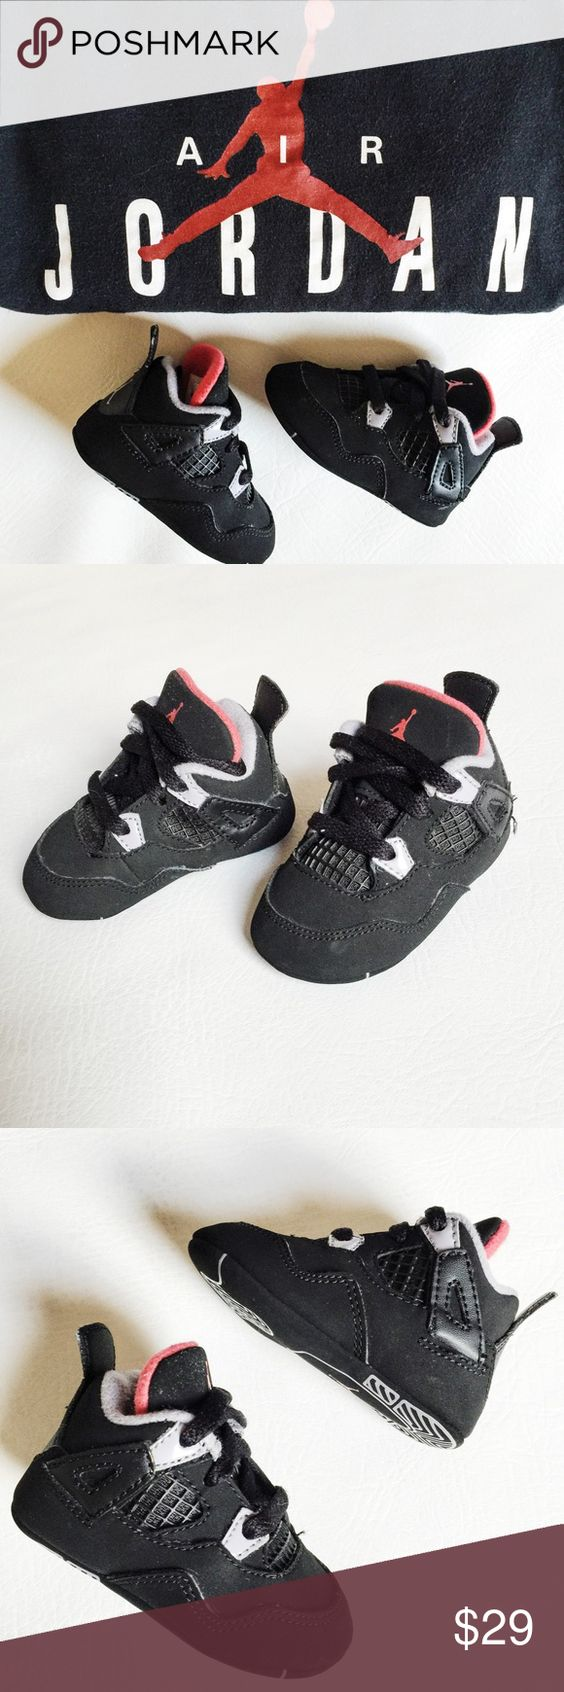 Crib jordans for sale - Sale Nike Air Jordan Retro 4 Infant Shoes Nike Air Jordan Retro